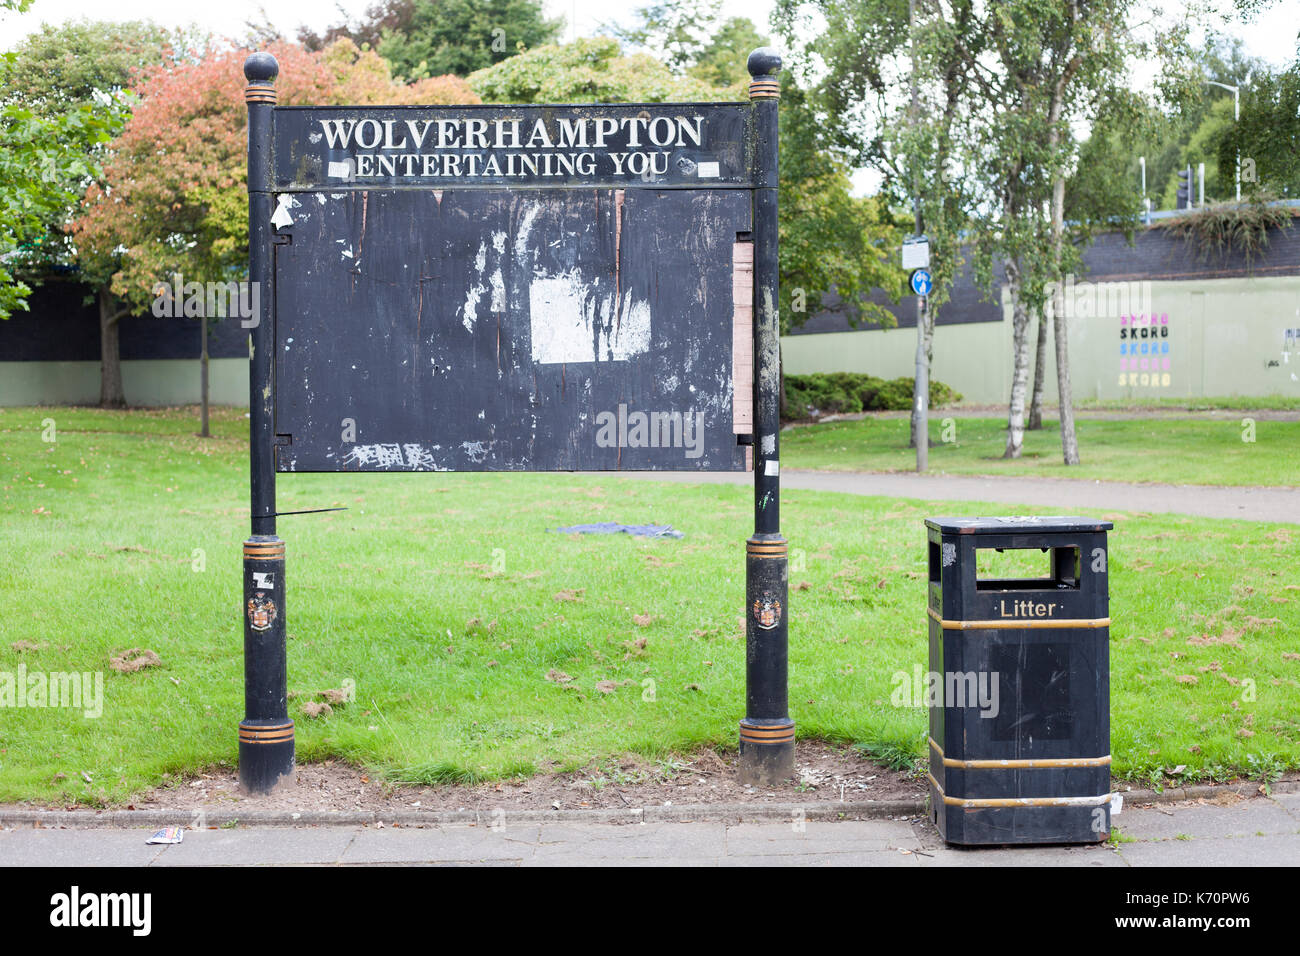 The noticeboard Wolverhampton entertaining you - Stock Image